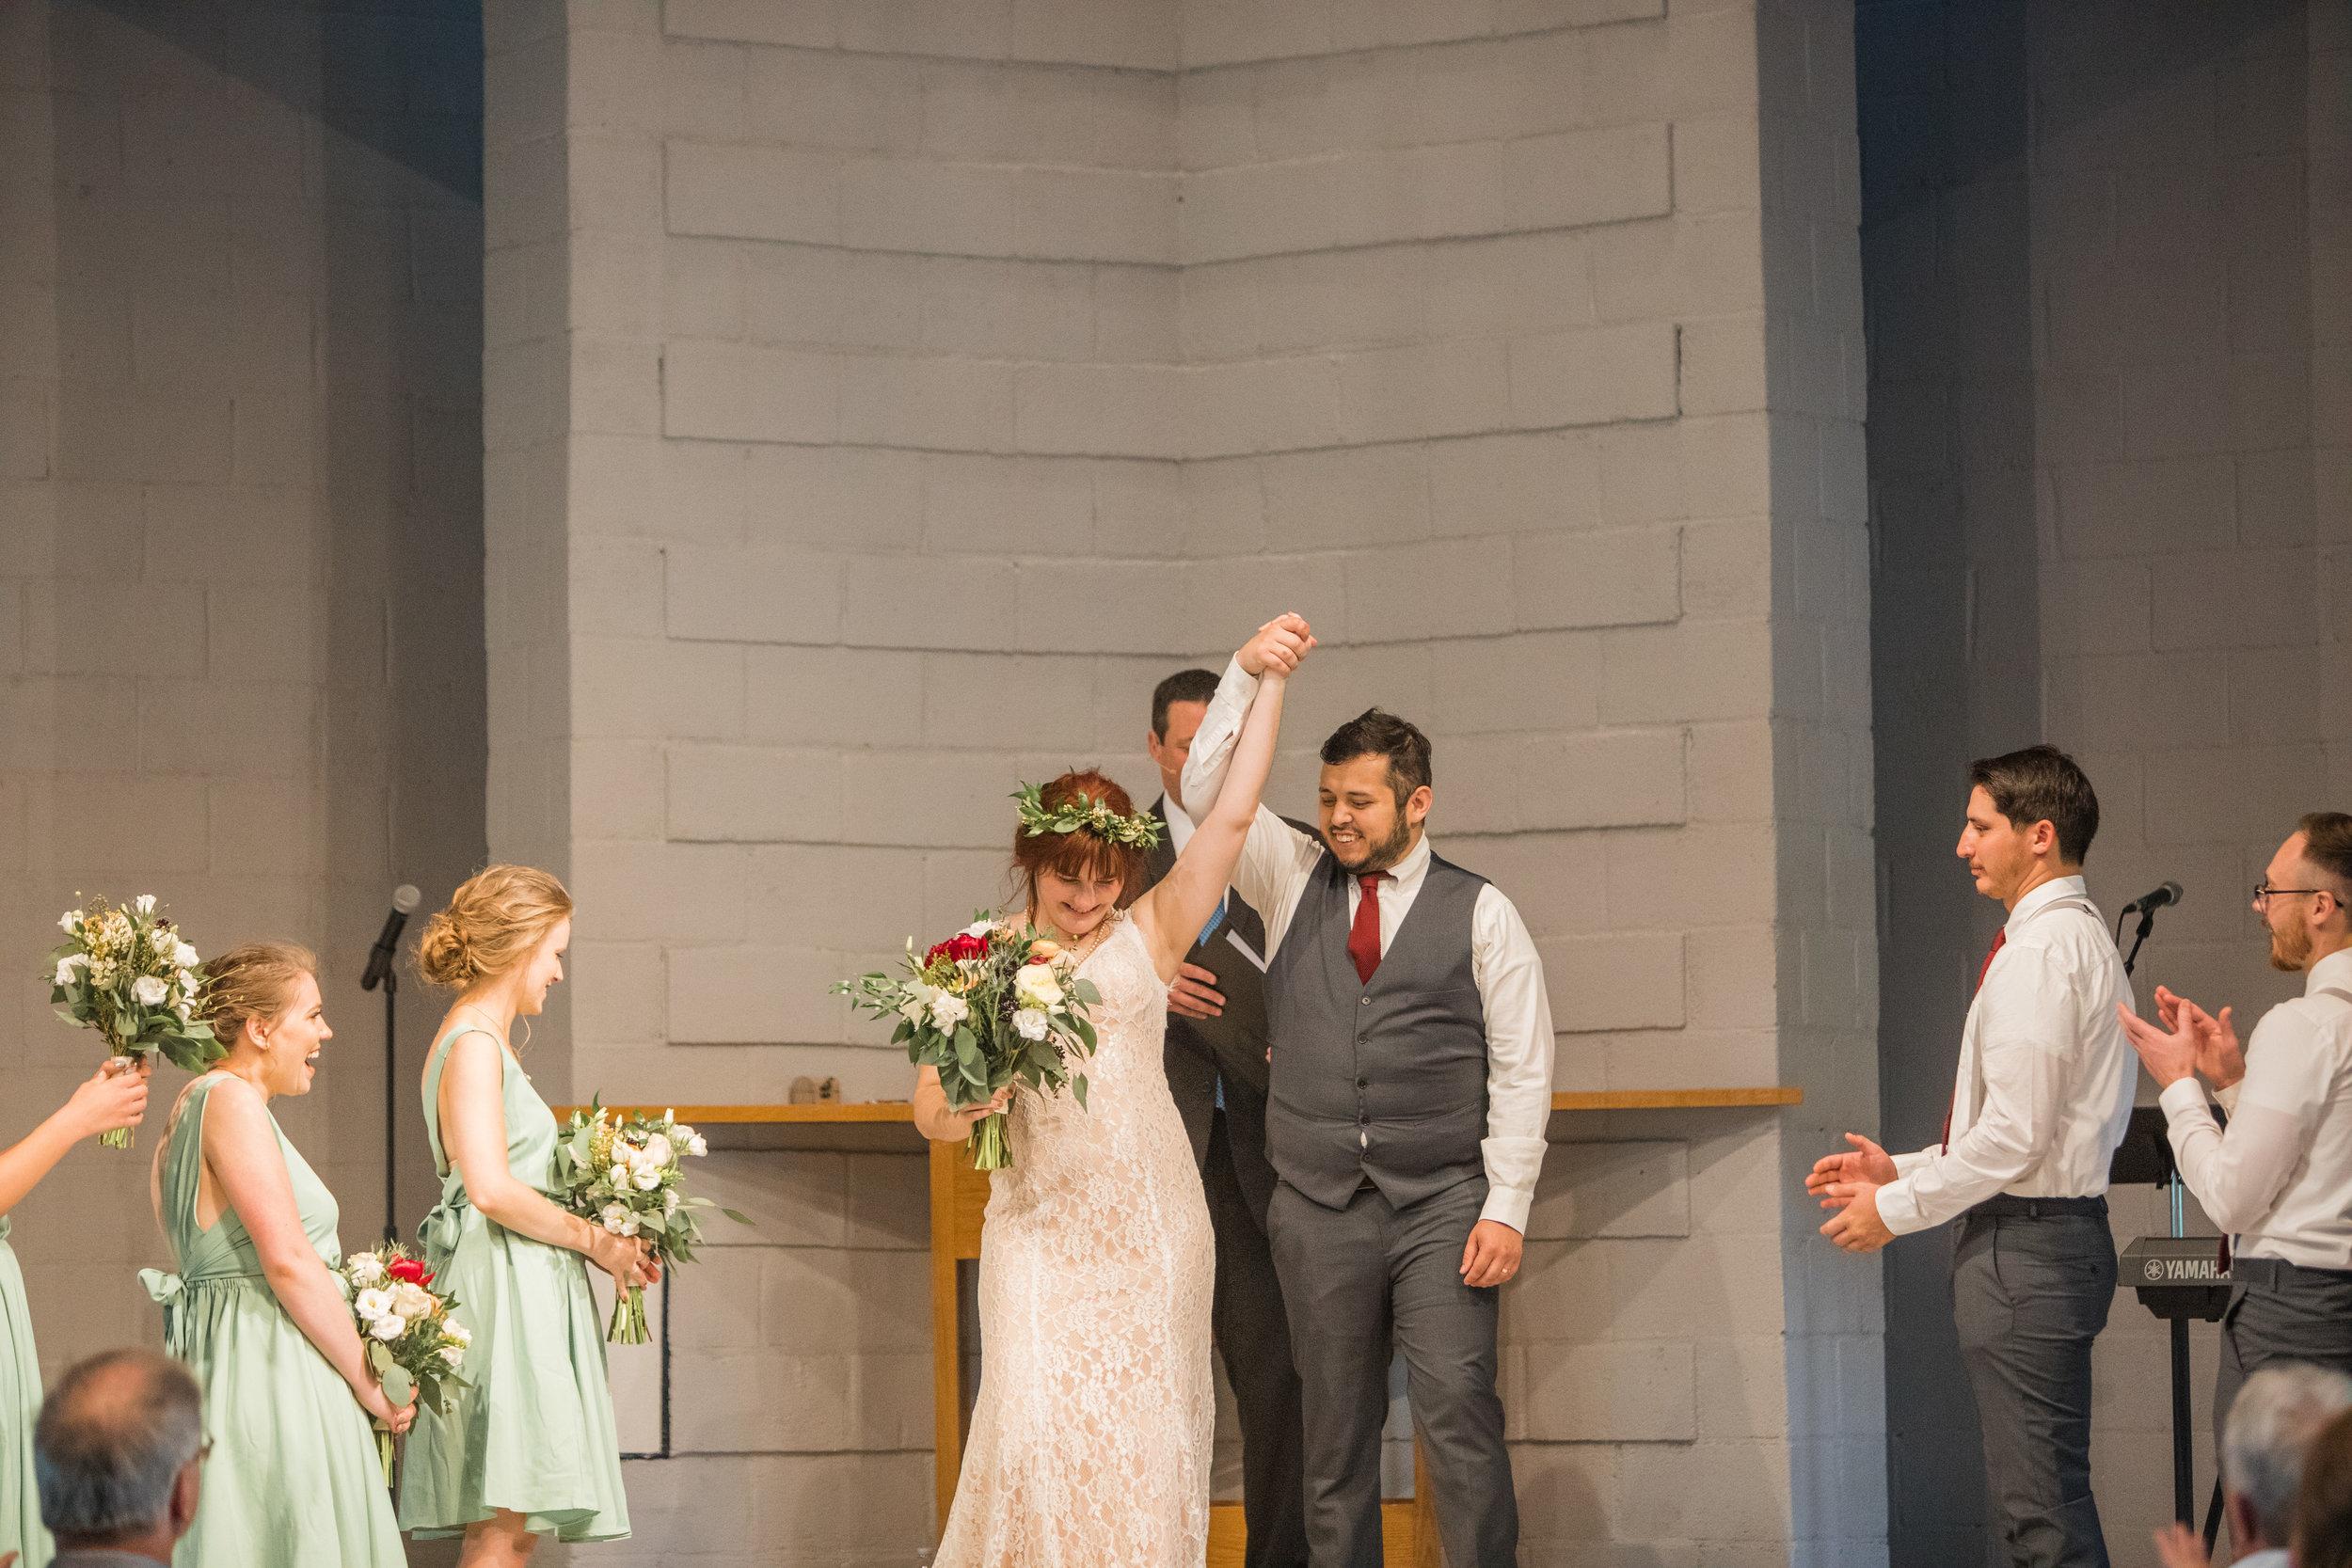 morganne and bobby wedding ceremony